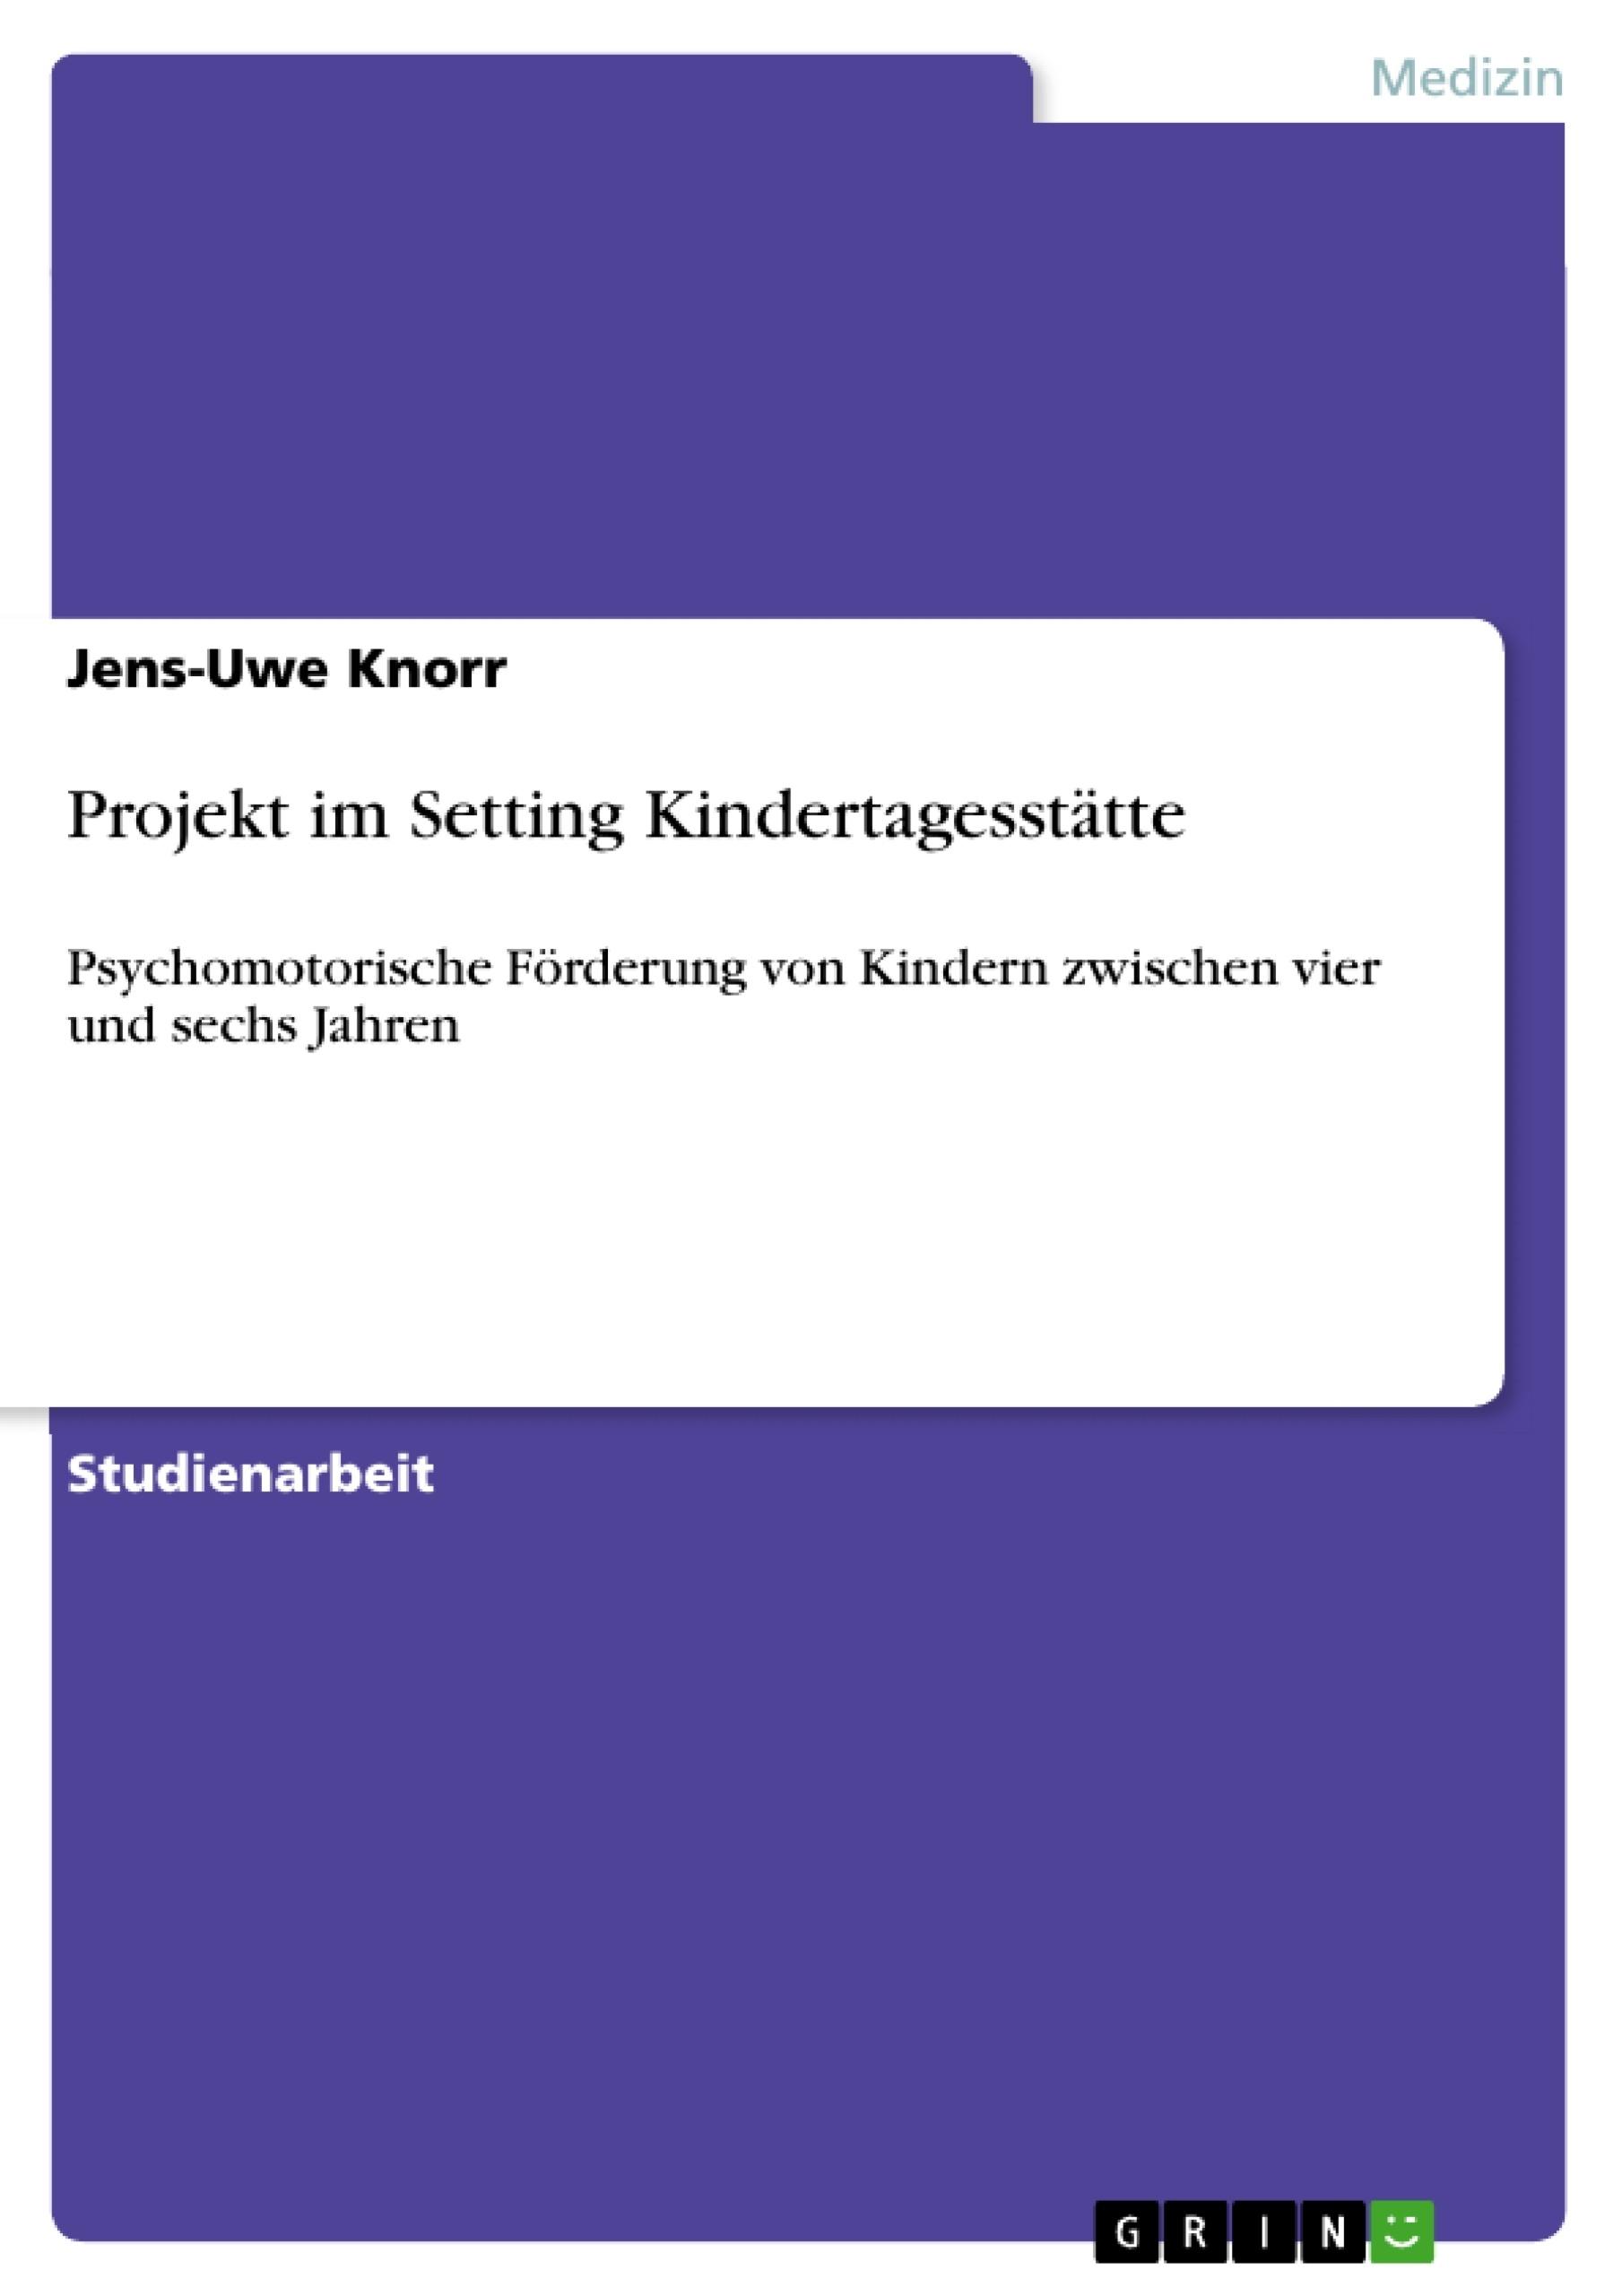 Titel: Projekt im Setting Kindertagesstätte